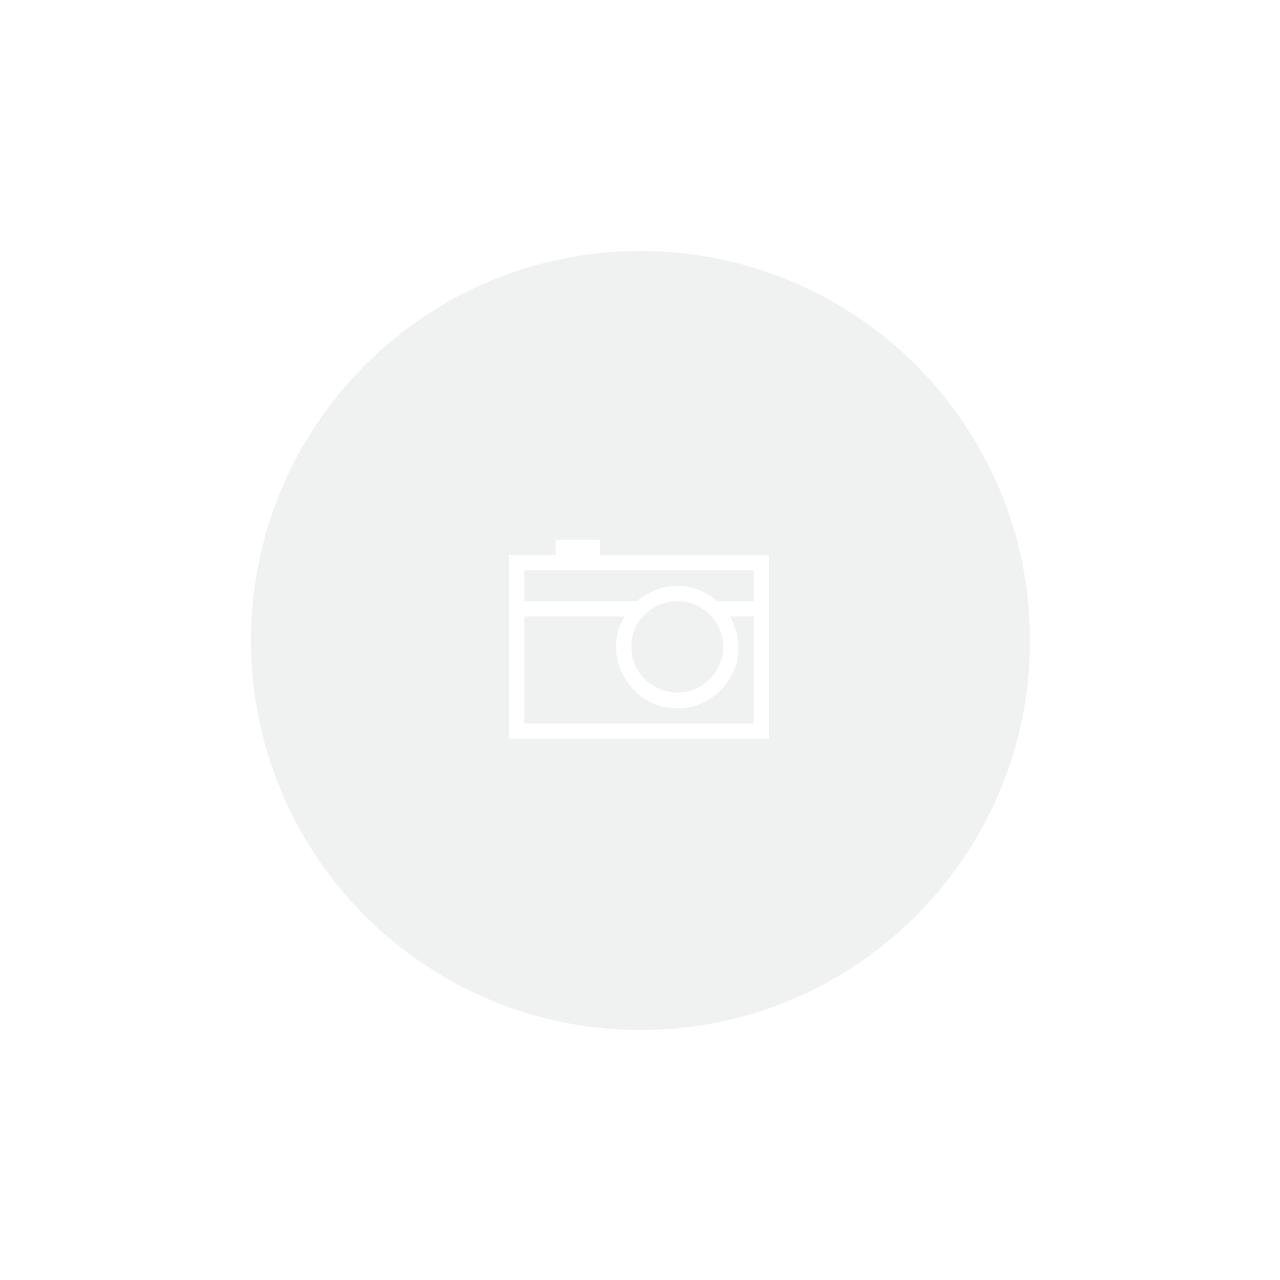 Bandeja Retangular em Aço Inox 35x24 cm Classic Tramontina